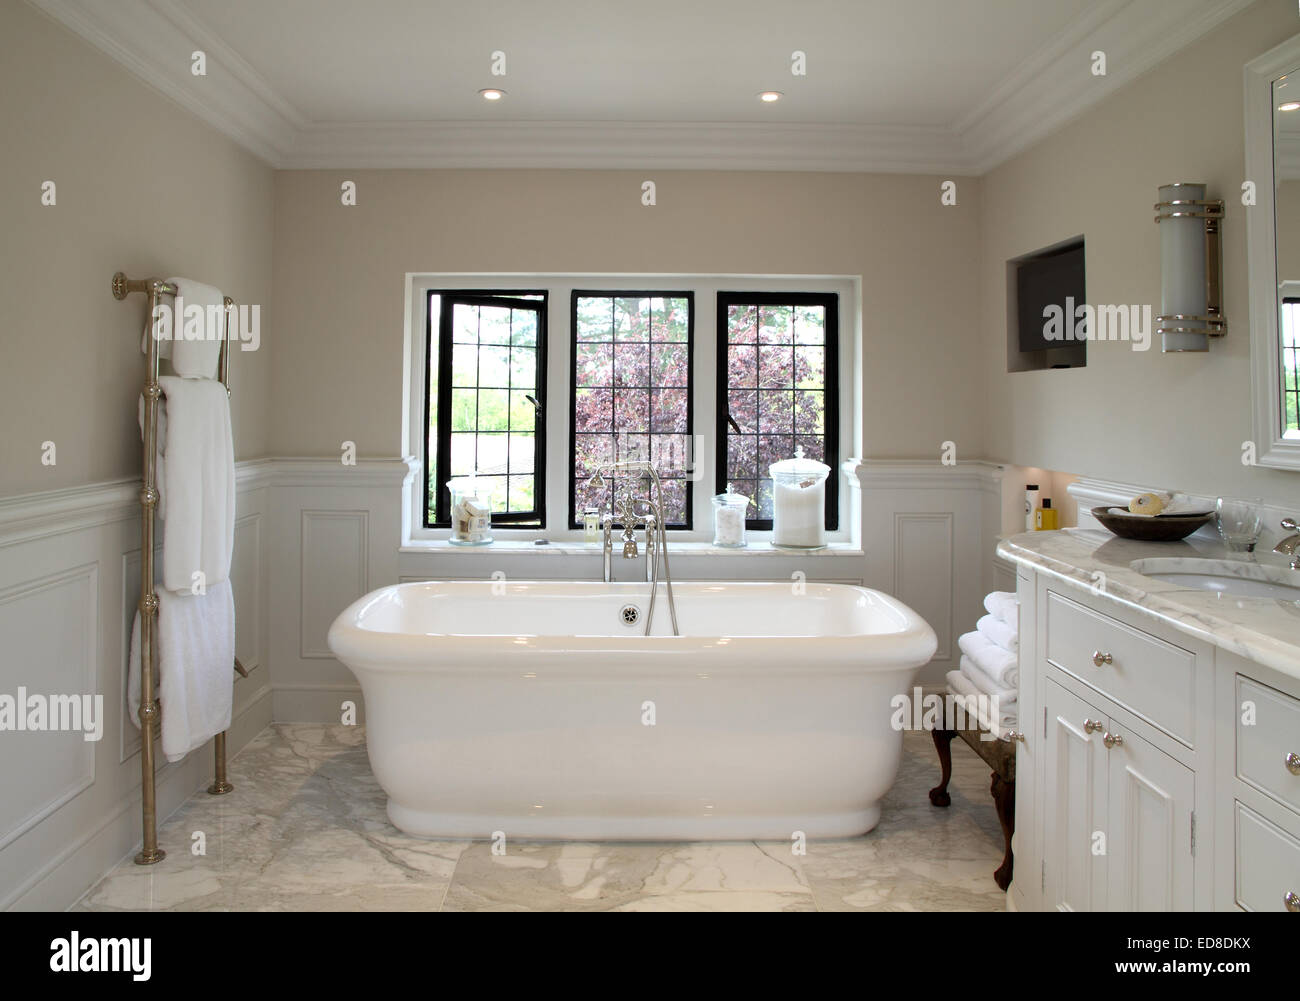 Art deco modern viktorianischen stil badezimmer stockfoto bild 77018366 alamy for Salle de bain art nouveau